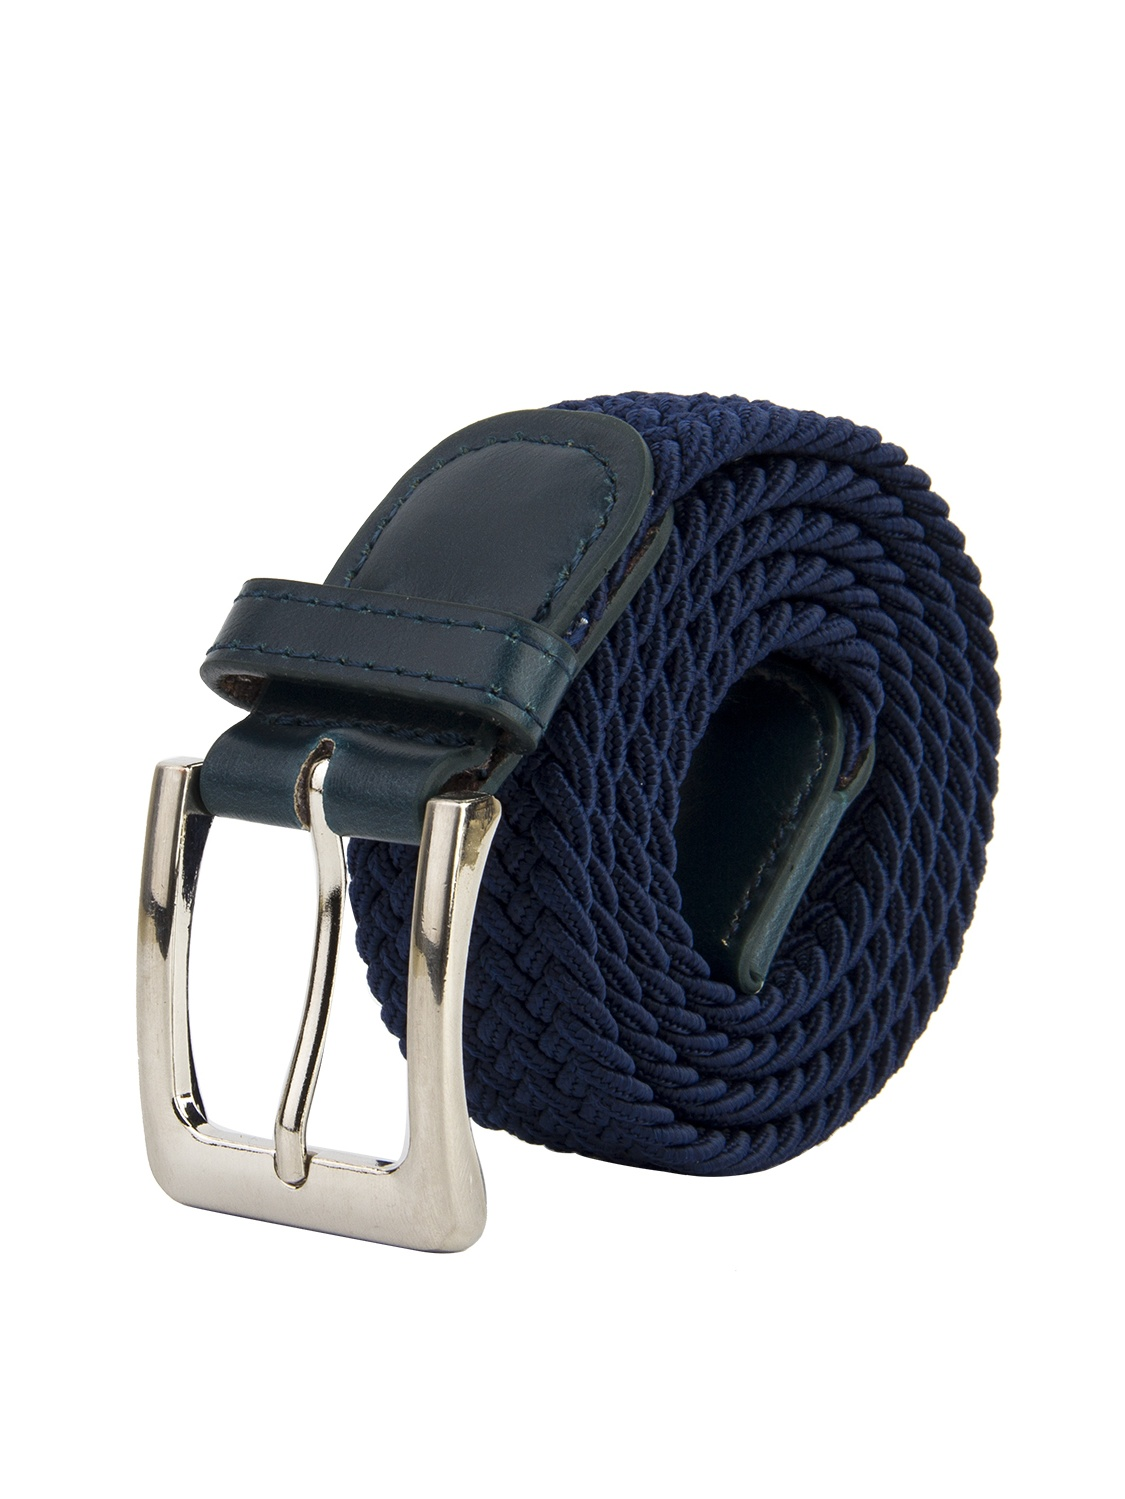 Martin Sports Nylon Football Belt 1 1//4 Inch x 60 Belt Black One Size Fits Most